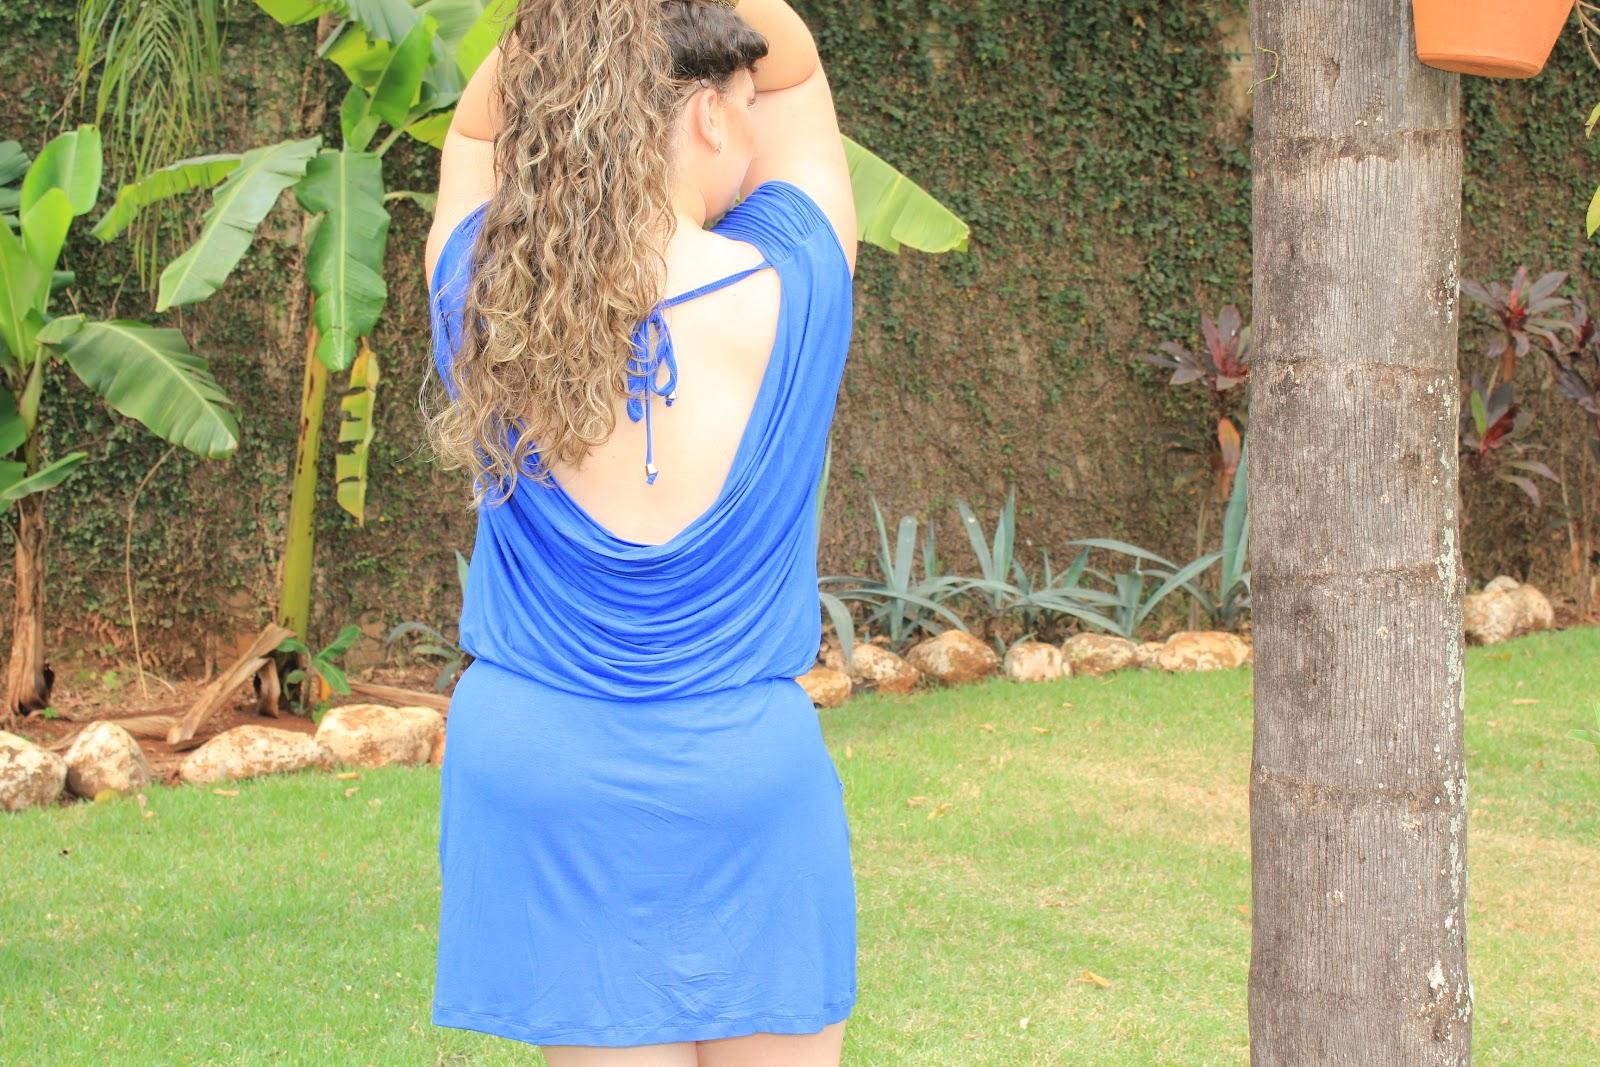 35c1393c6f Look da Lai – Vestido com elástico na cintura – Laiara Leoni